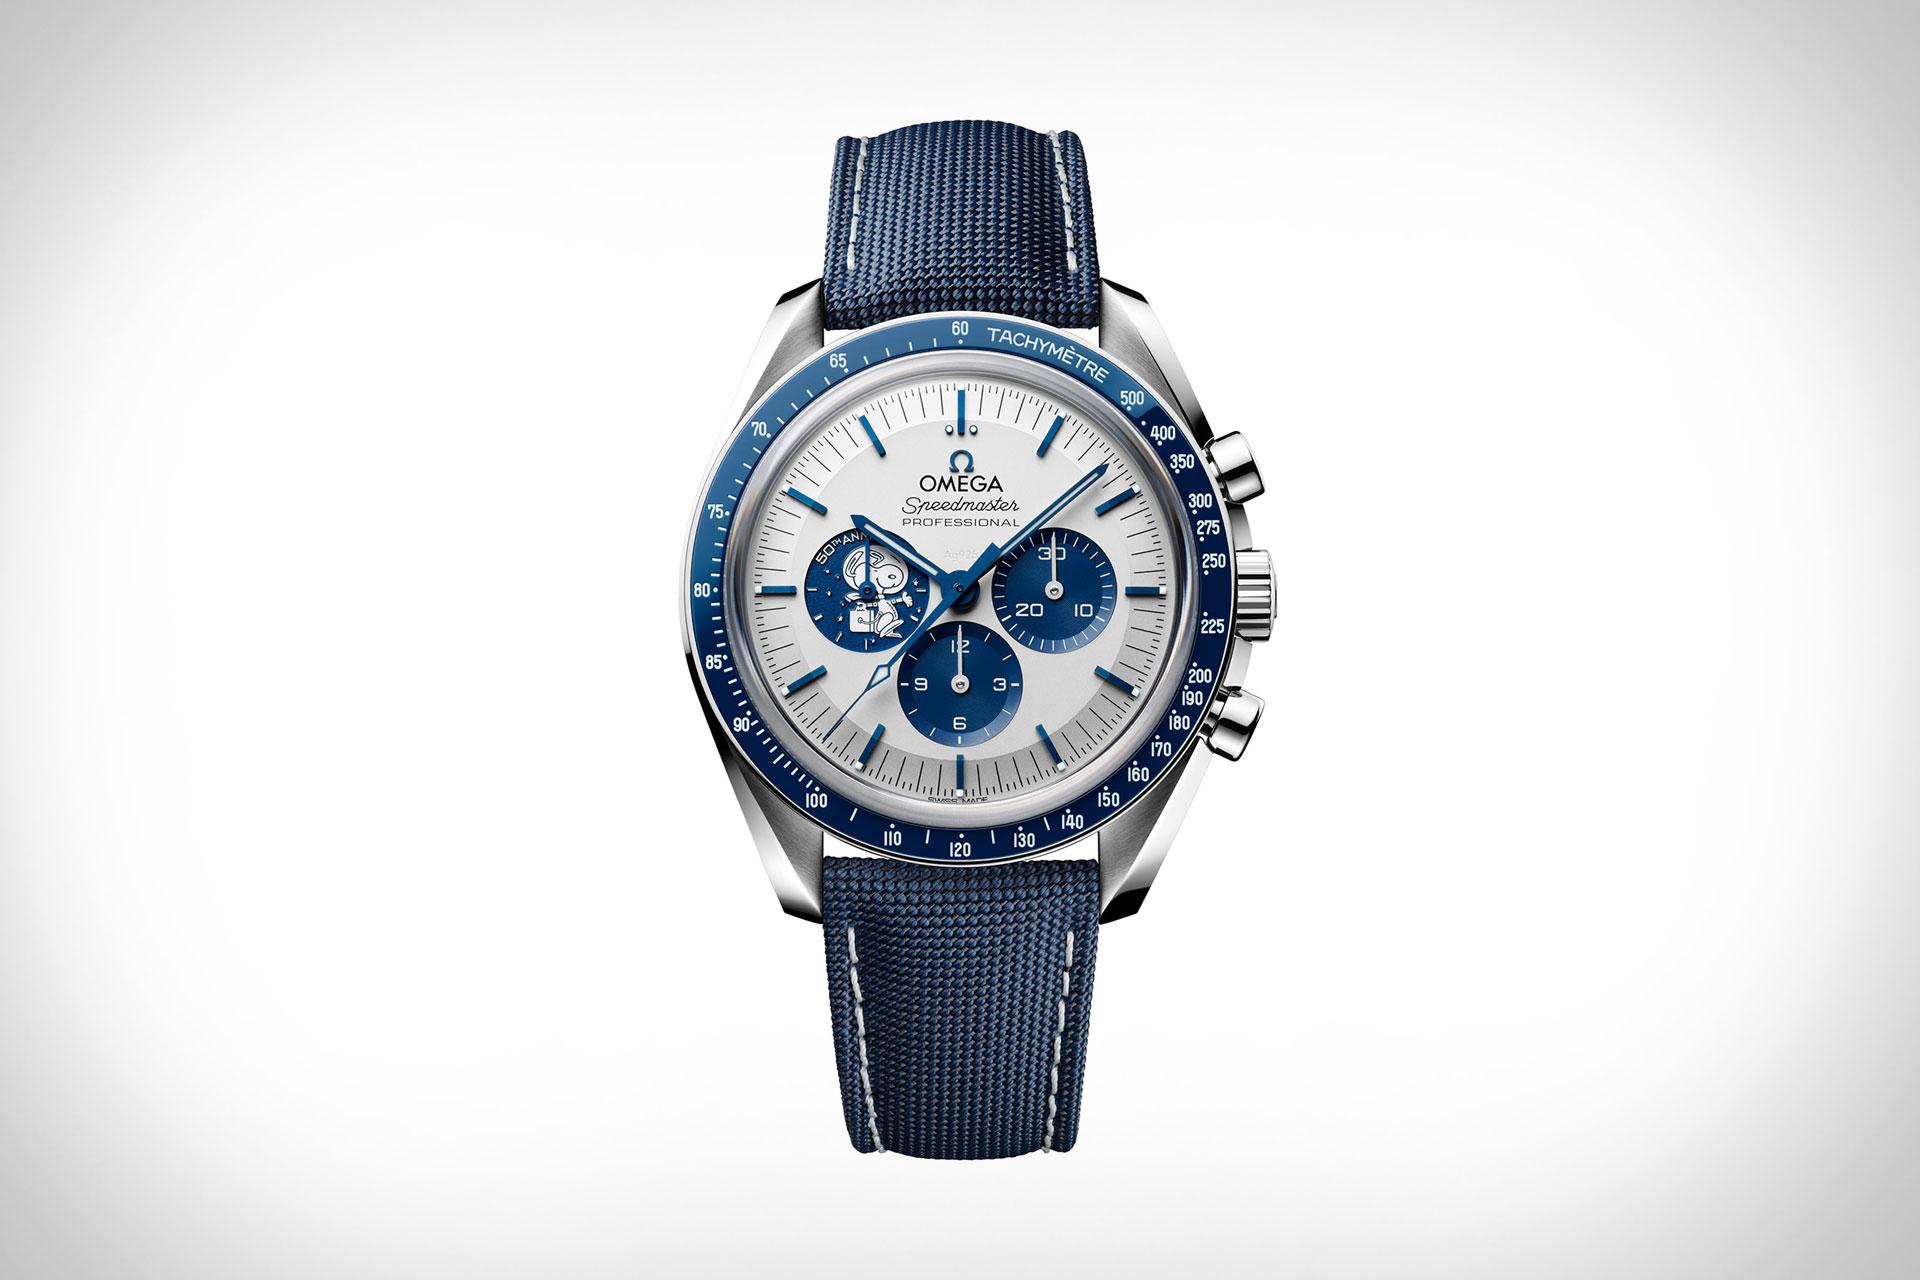 Omega Speedmaster Silver Snoopy Award Watch